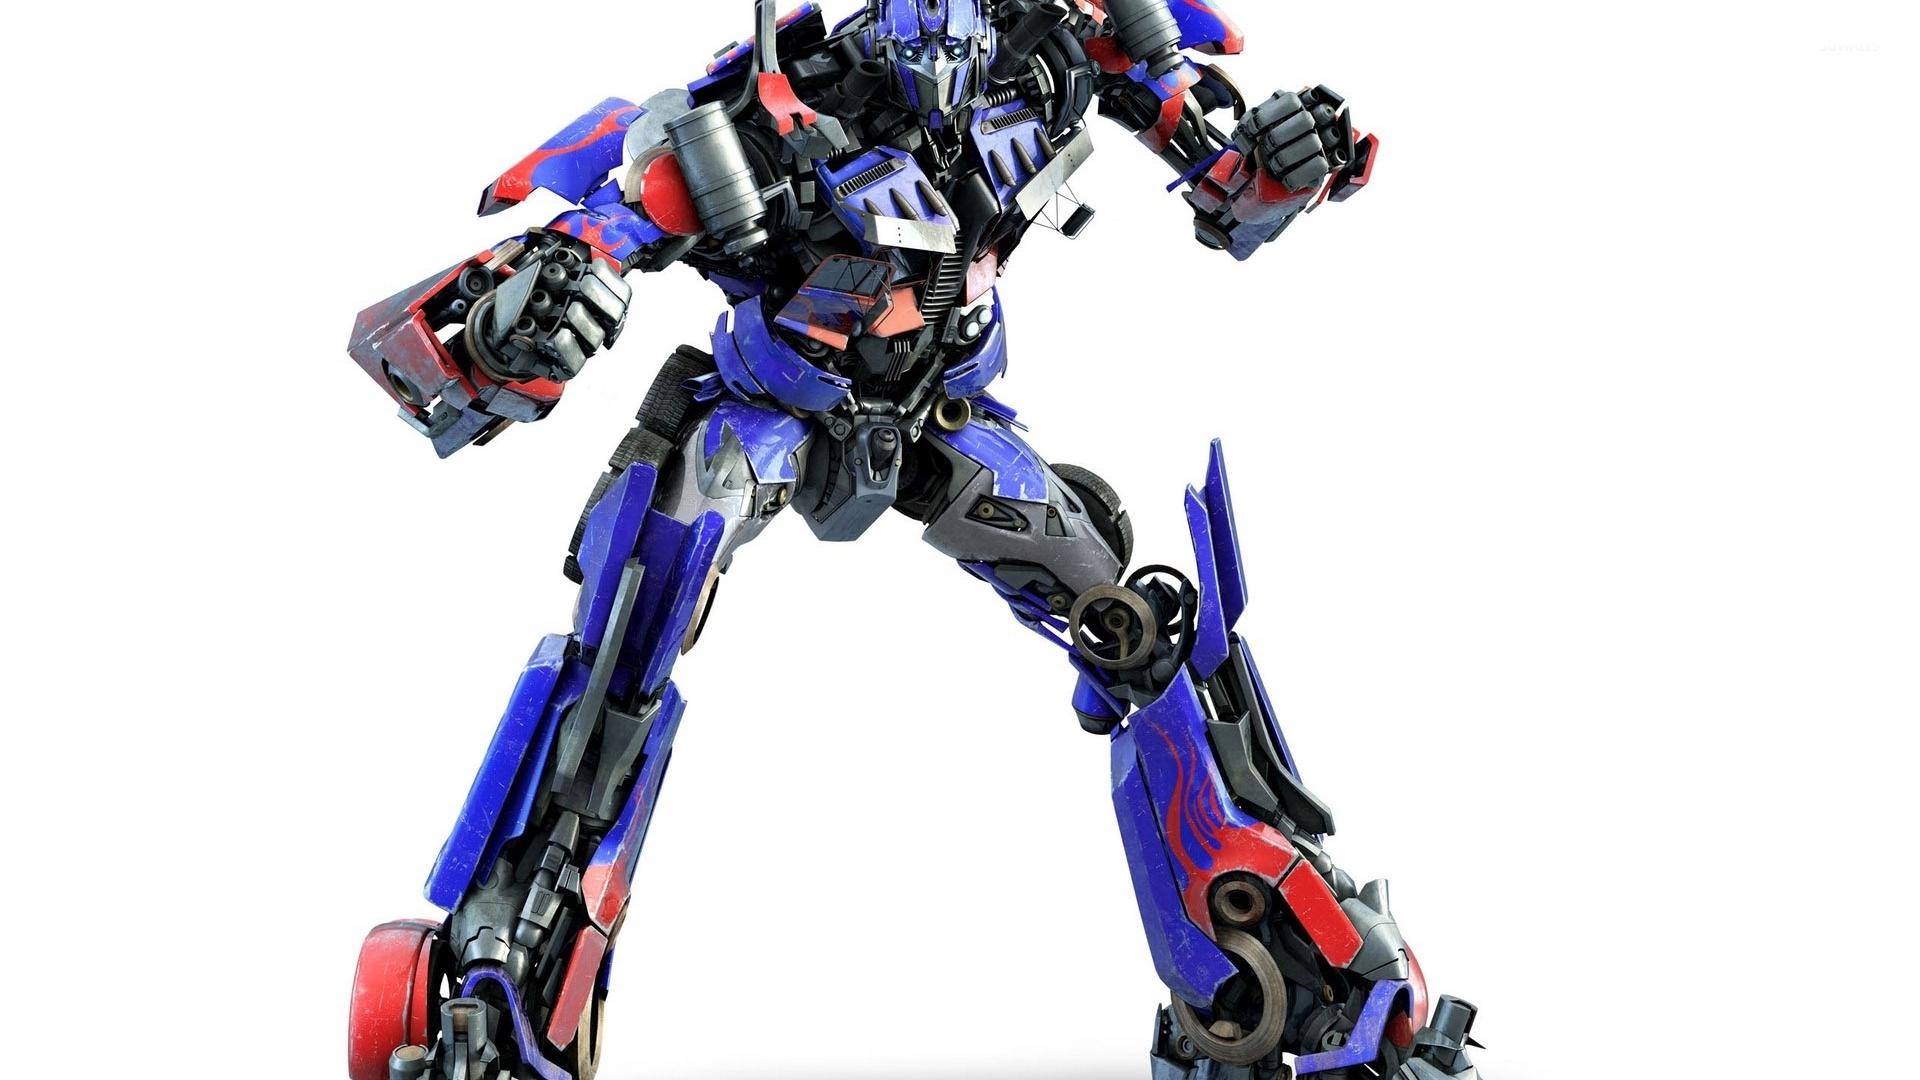 optimus prime transformers 9 wallpaper movie